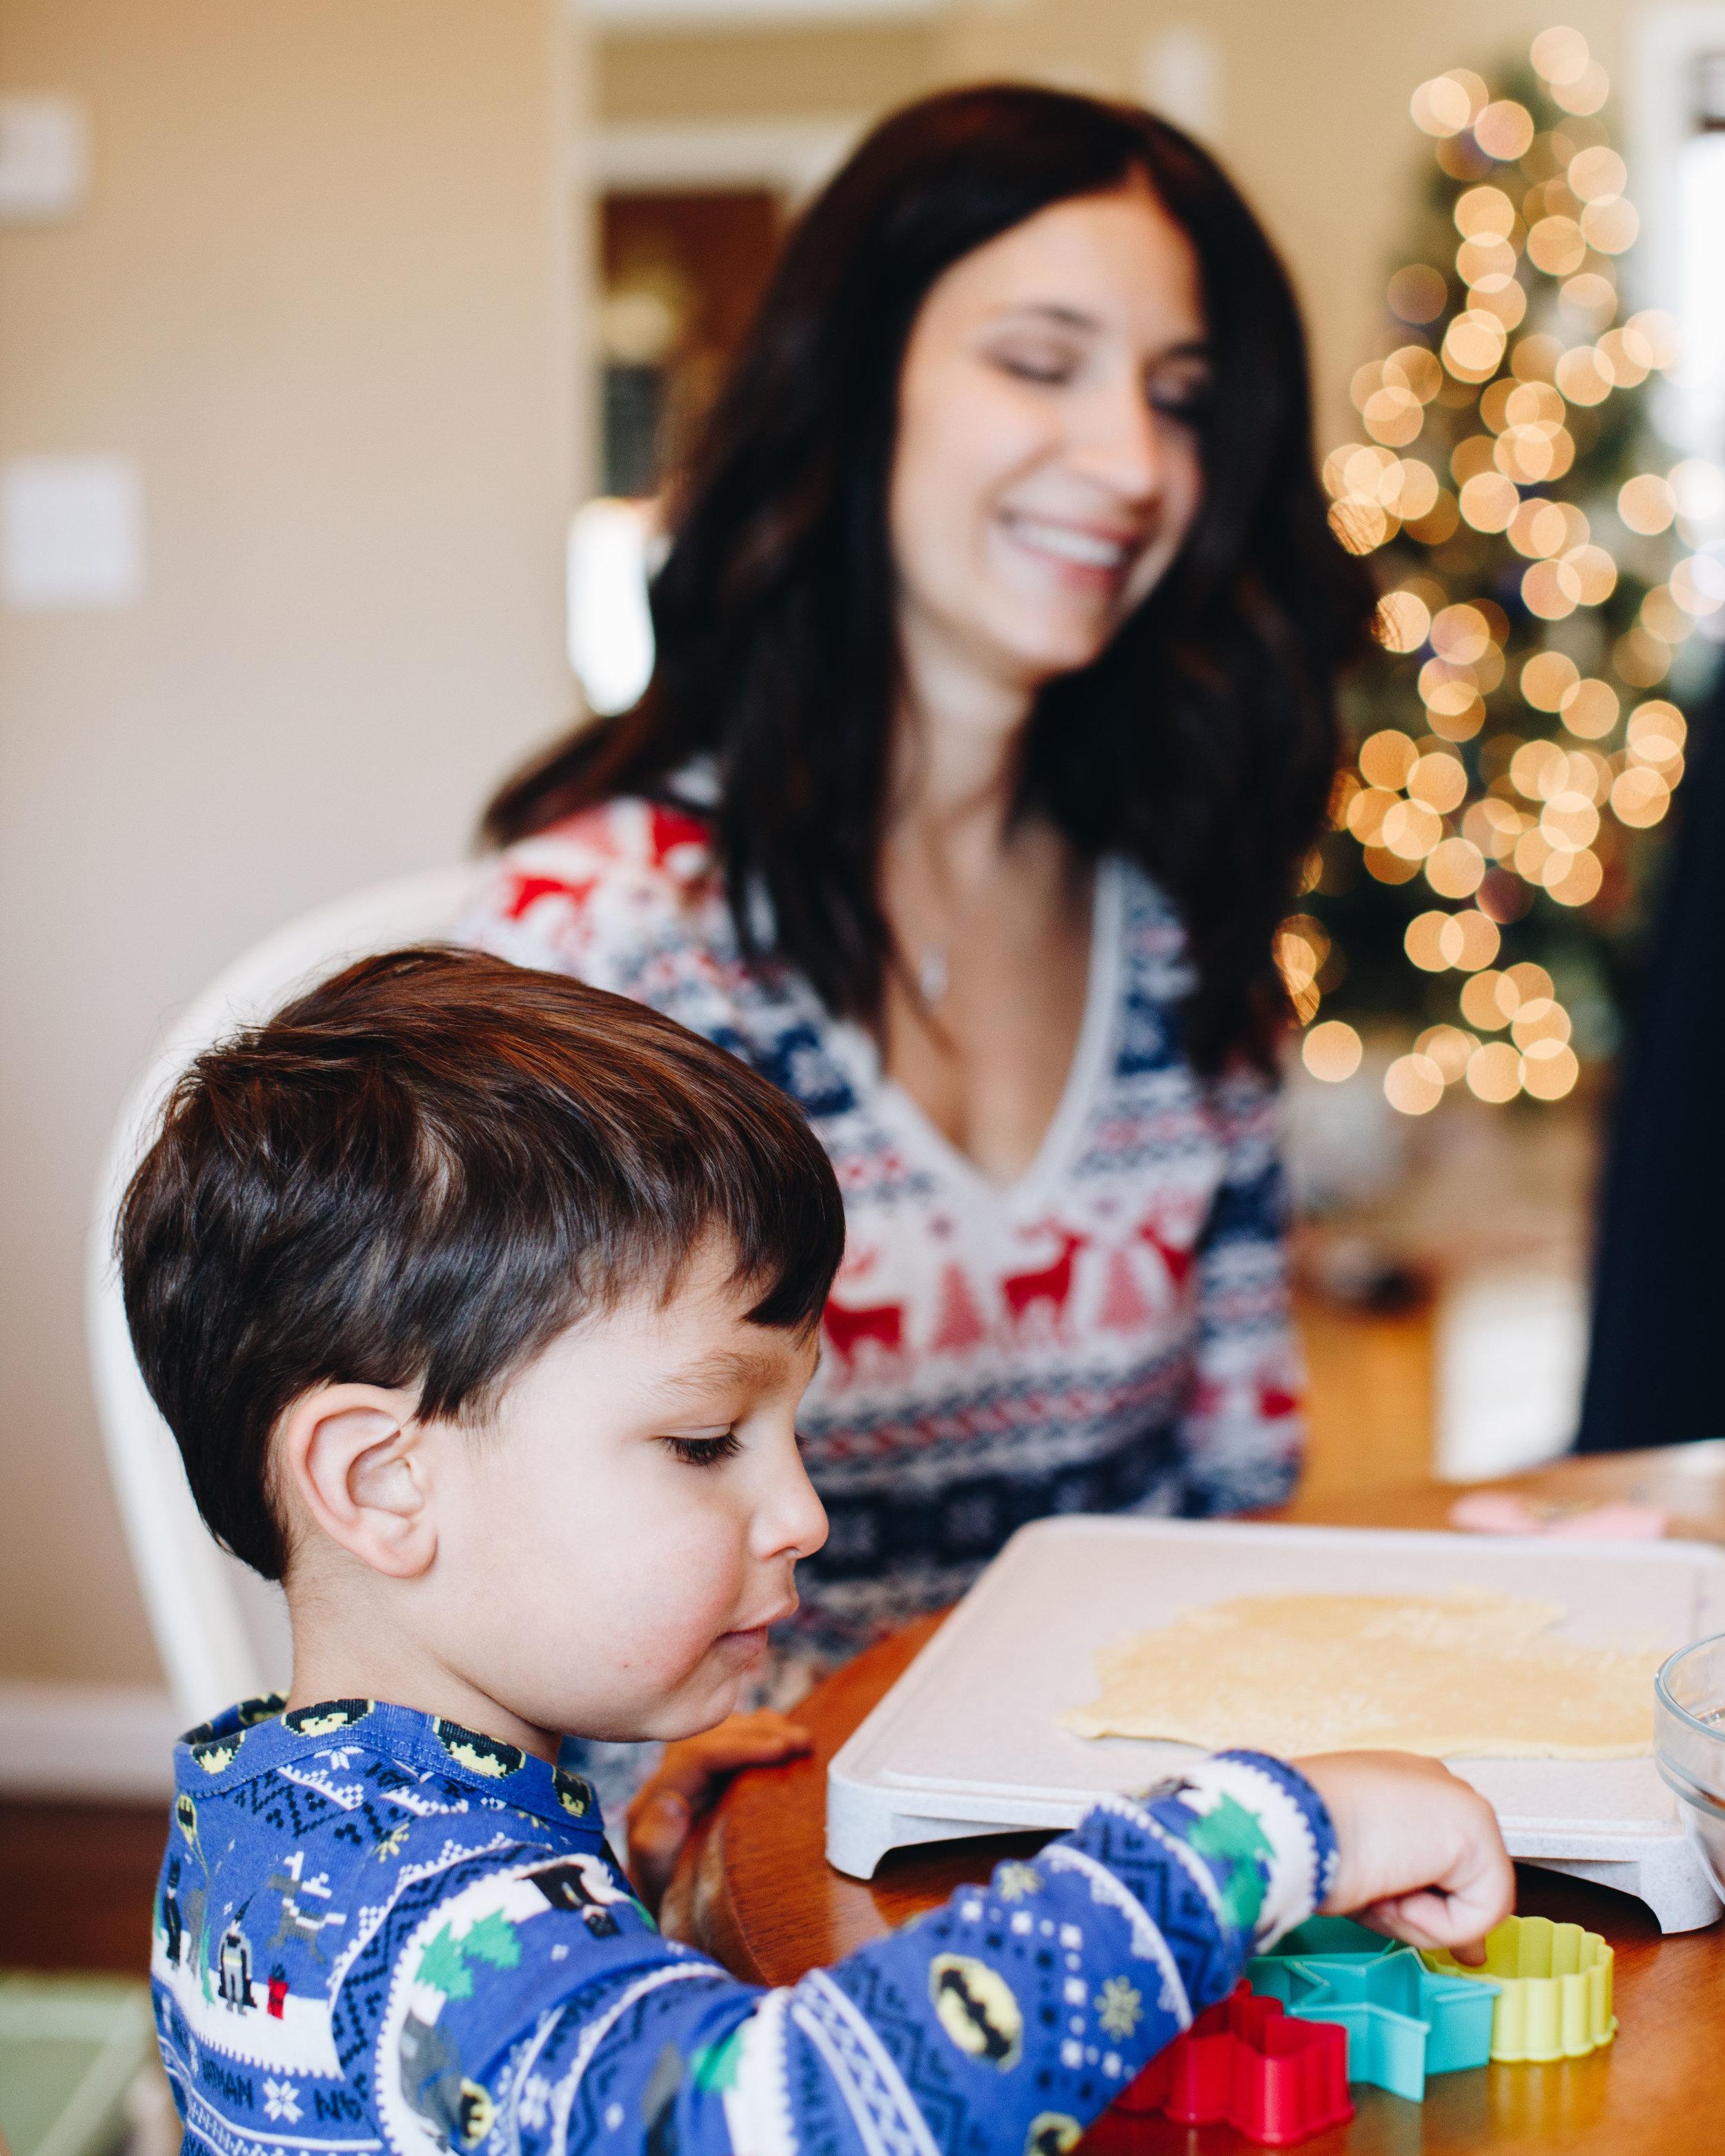 180912_Erin_Gerry_Christmas_home-107.jpg